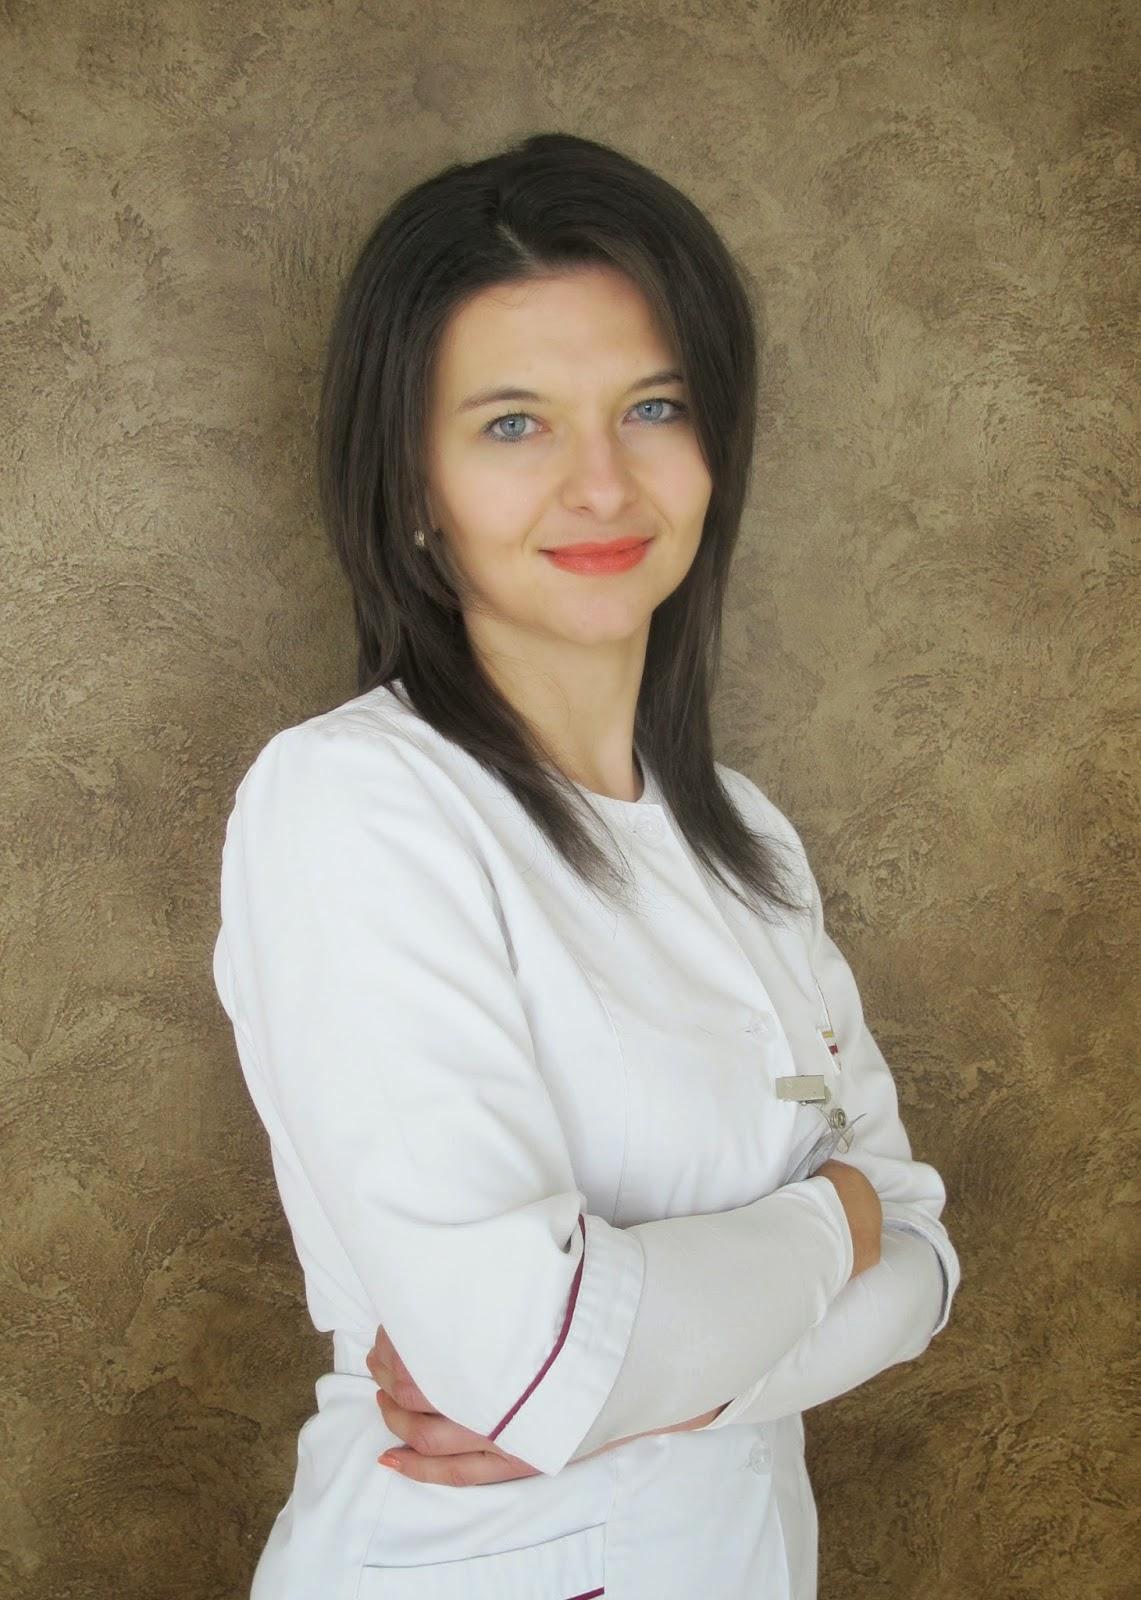 лікар-кардіолог Оксана Барабаш